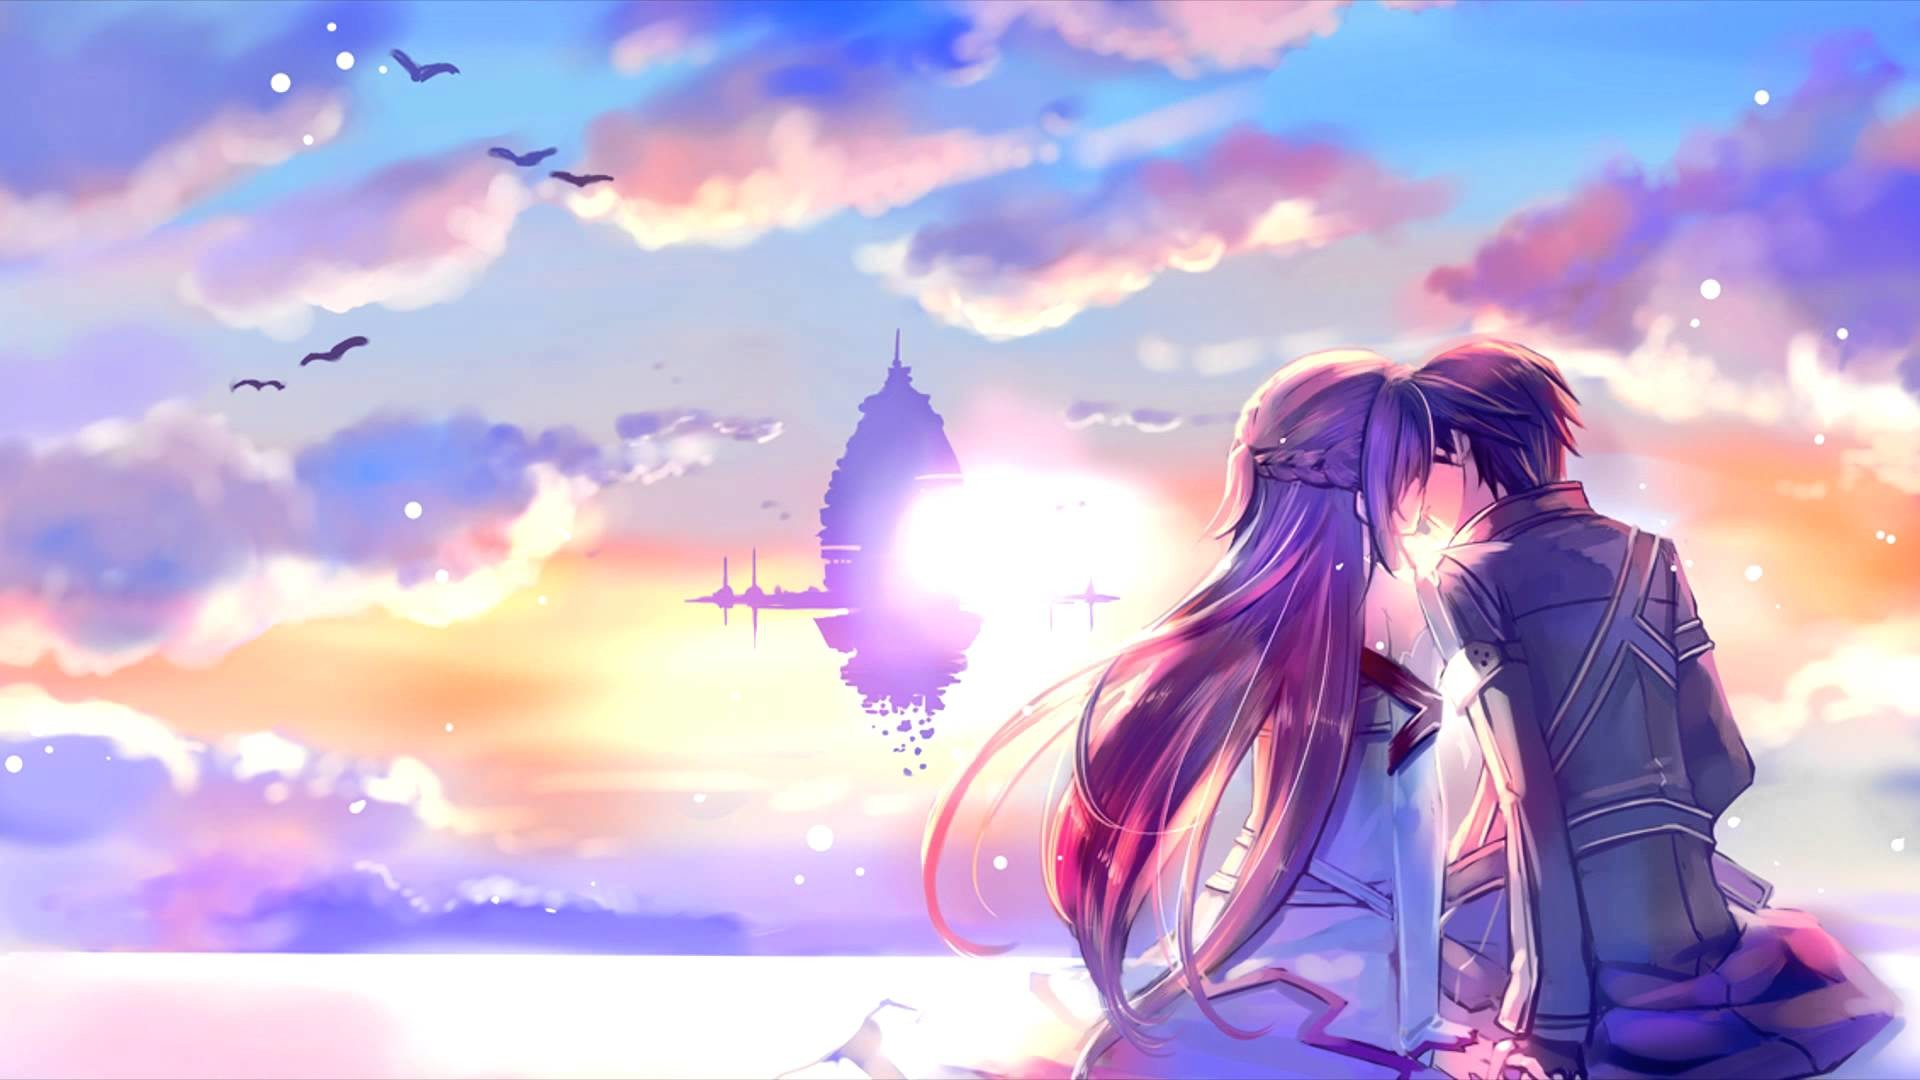 Anime Love Wallpapers: Anime Love Wallpaper ·①